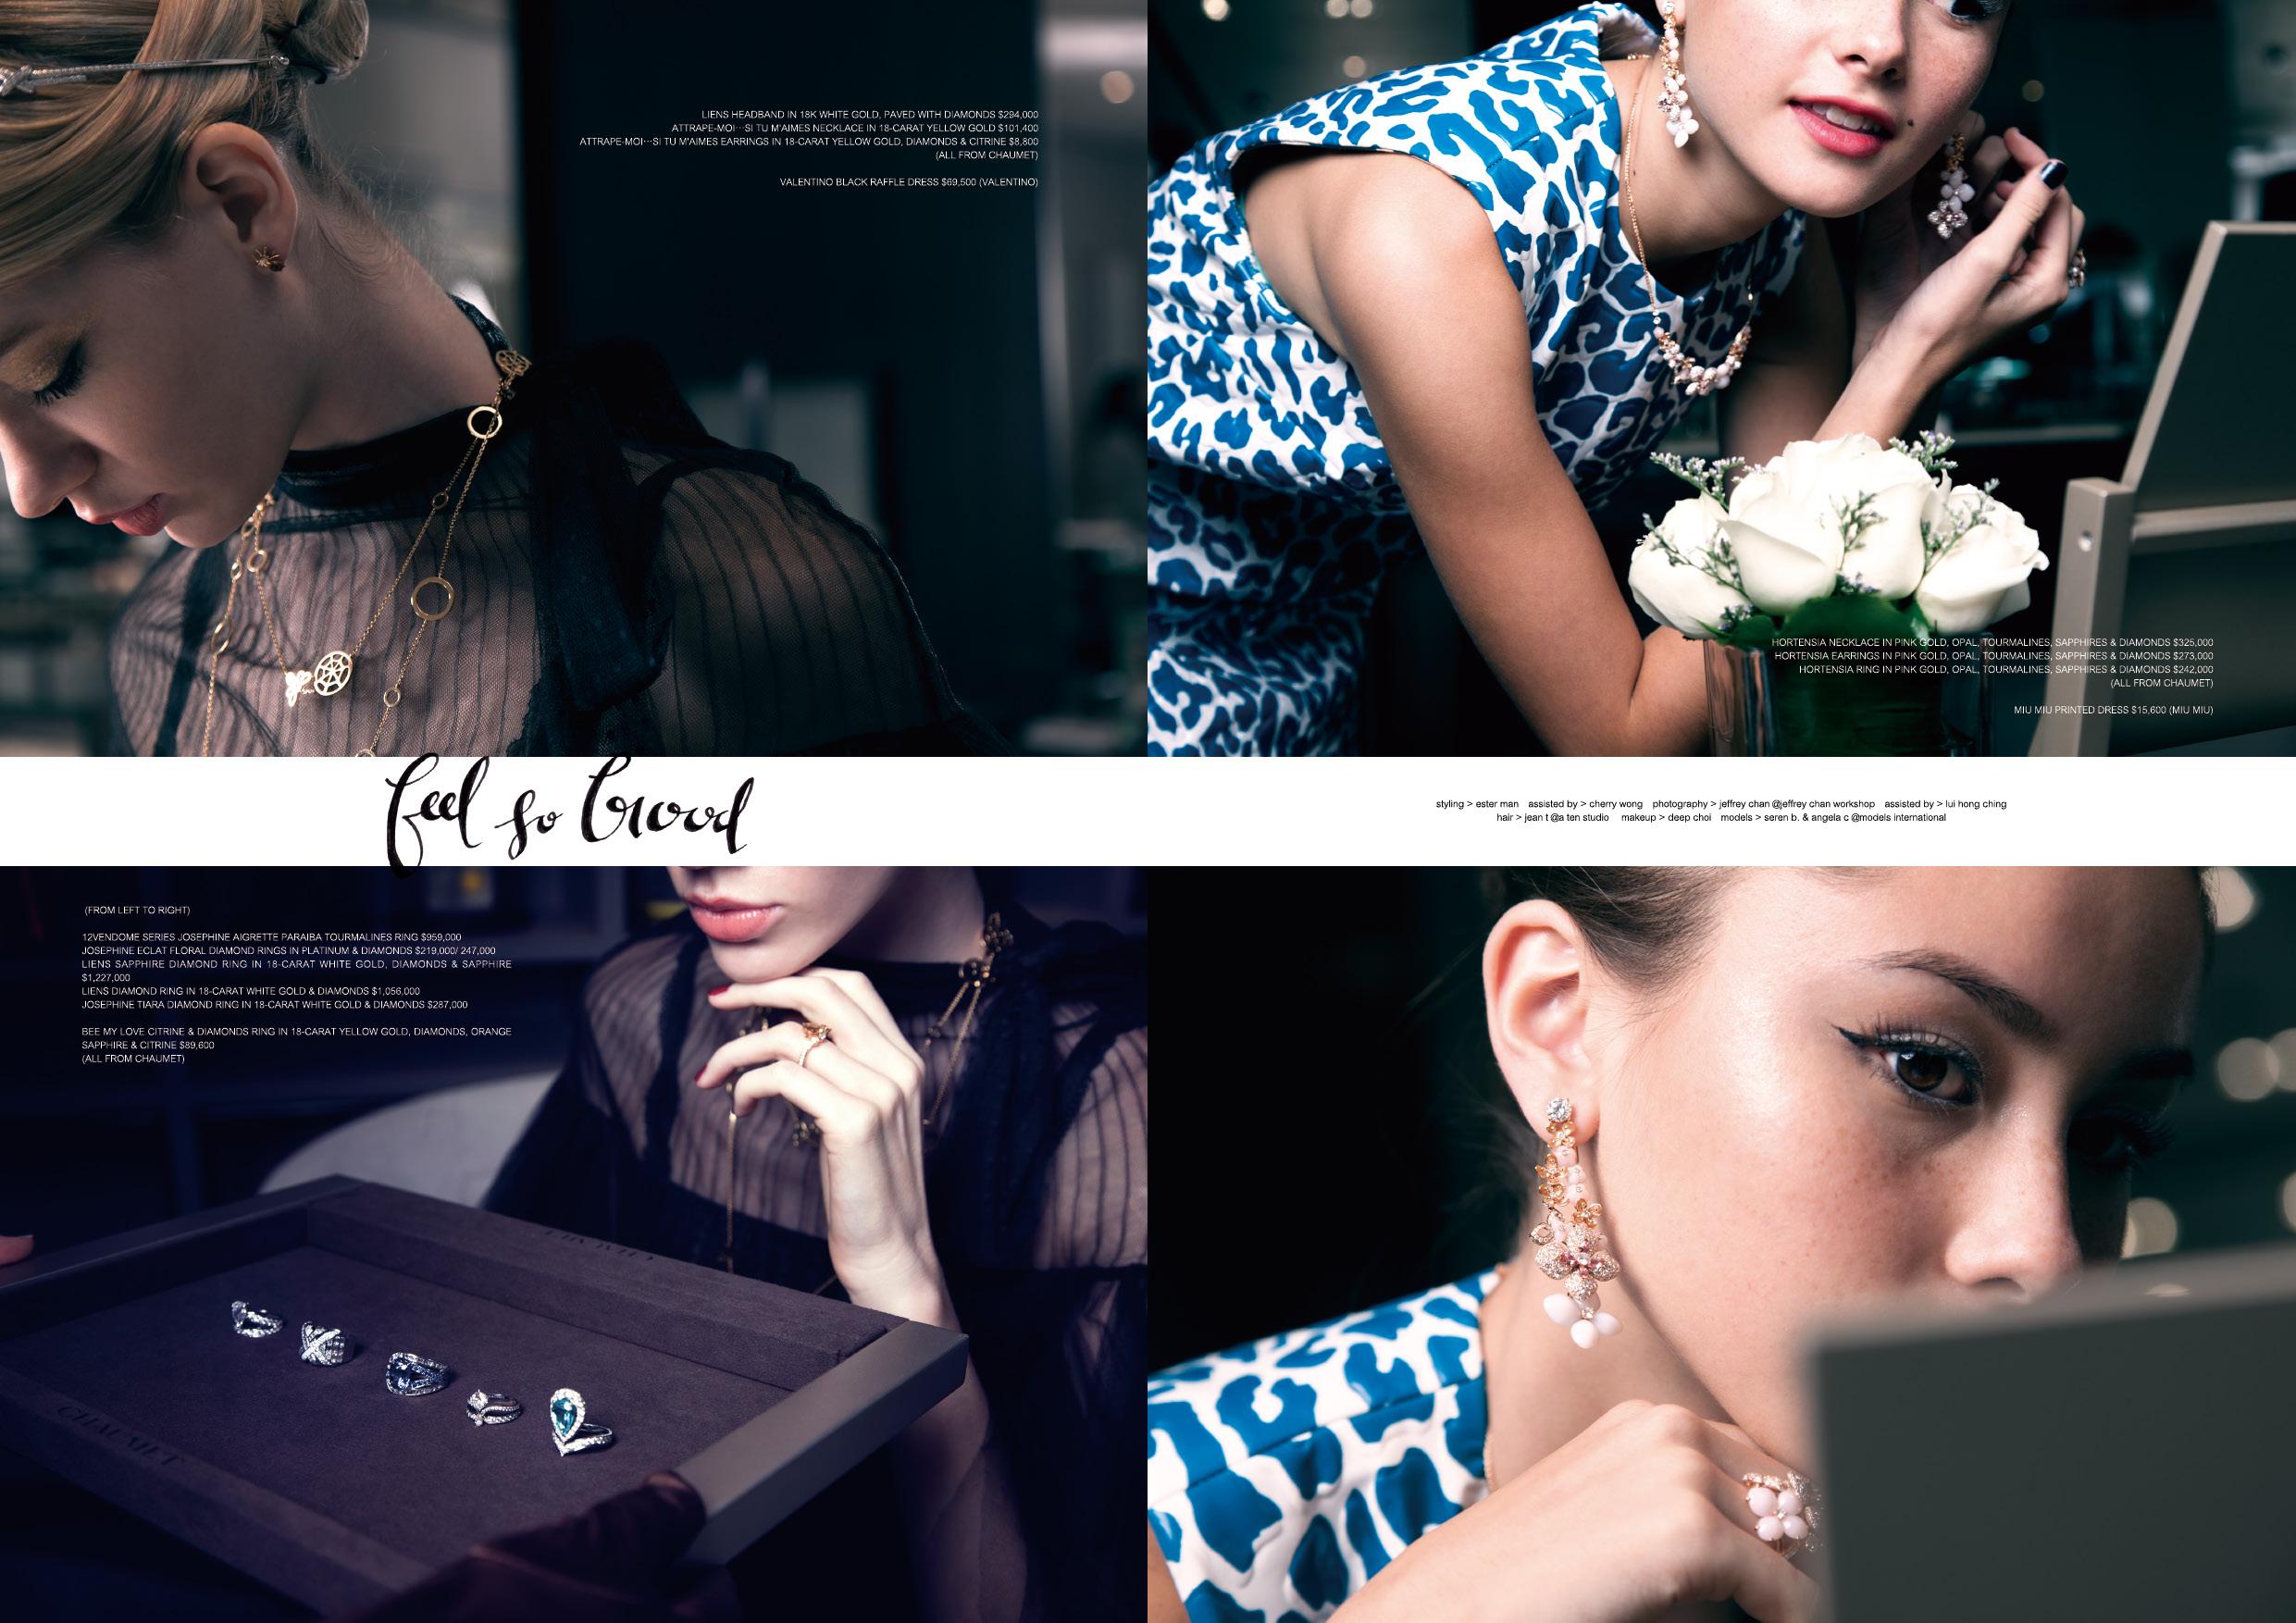 x111_136-145_jewel_model styling.jpg